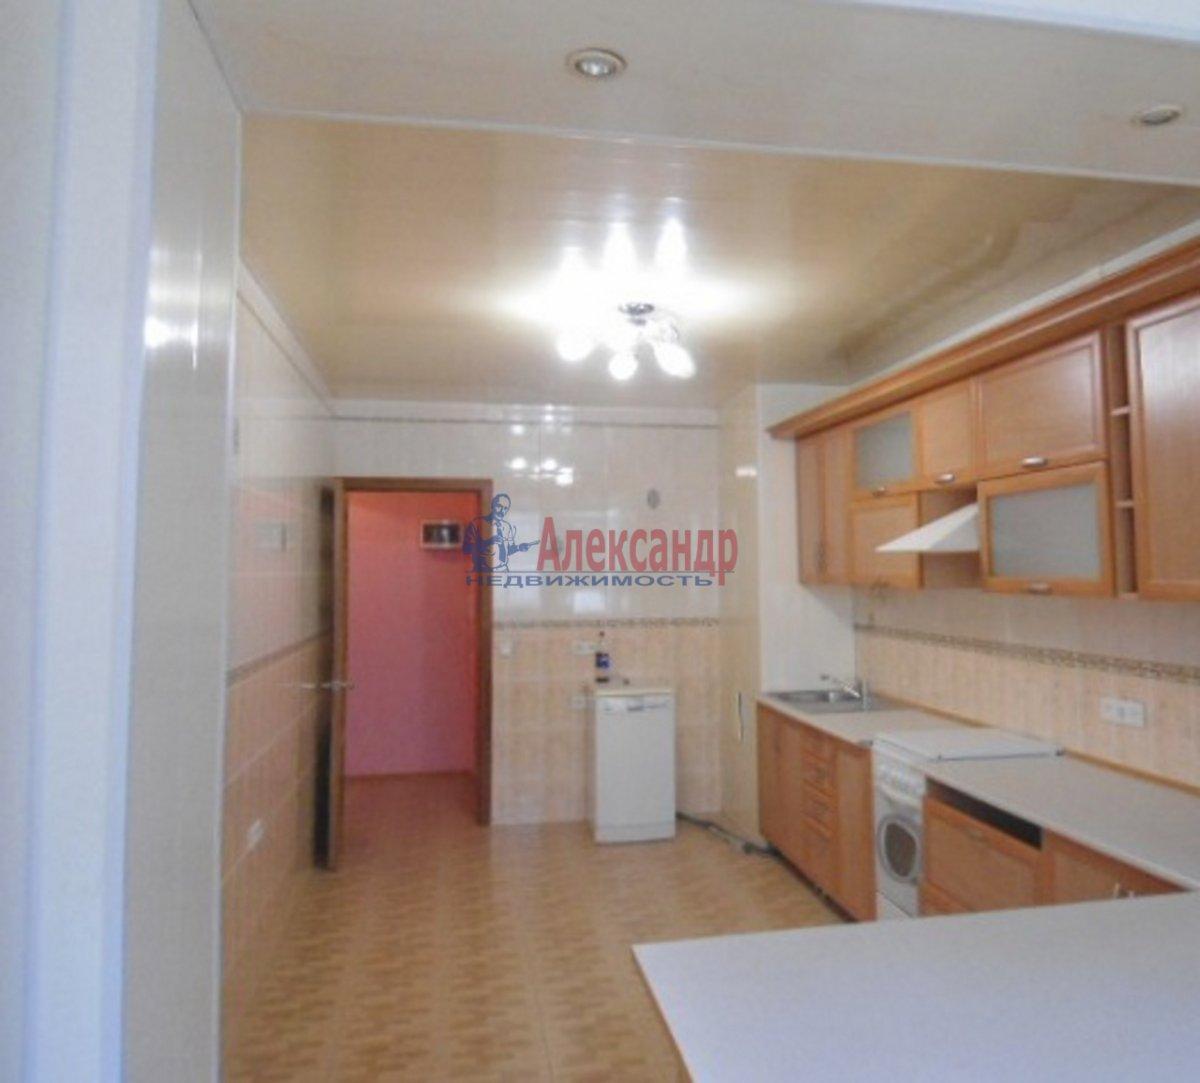 2-комнатная квартира (56м2) в аренду по адресу Яхтенная ул., 9— фото 1 из 4